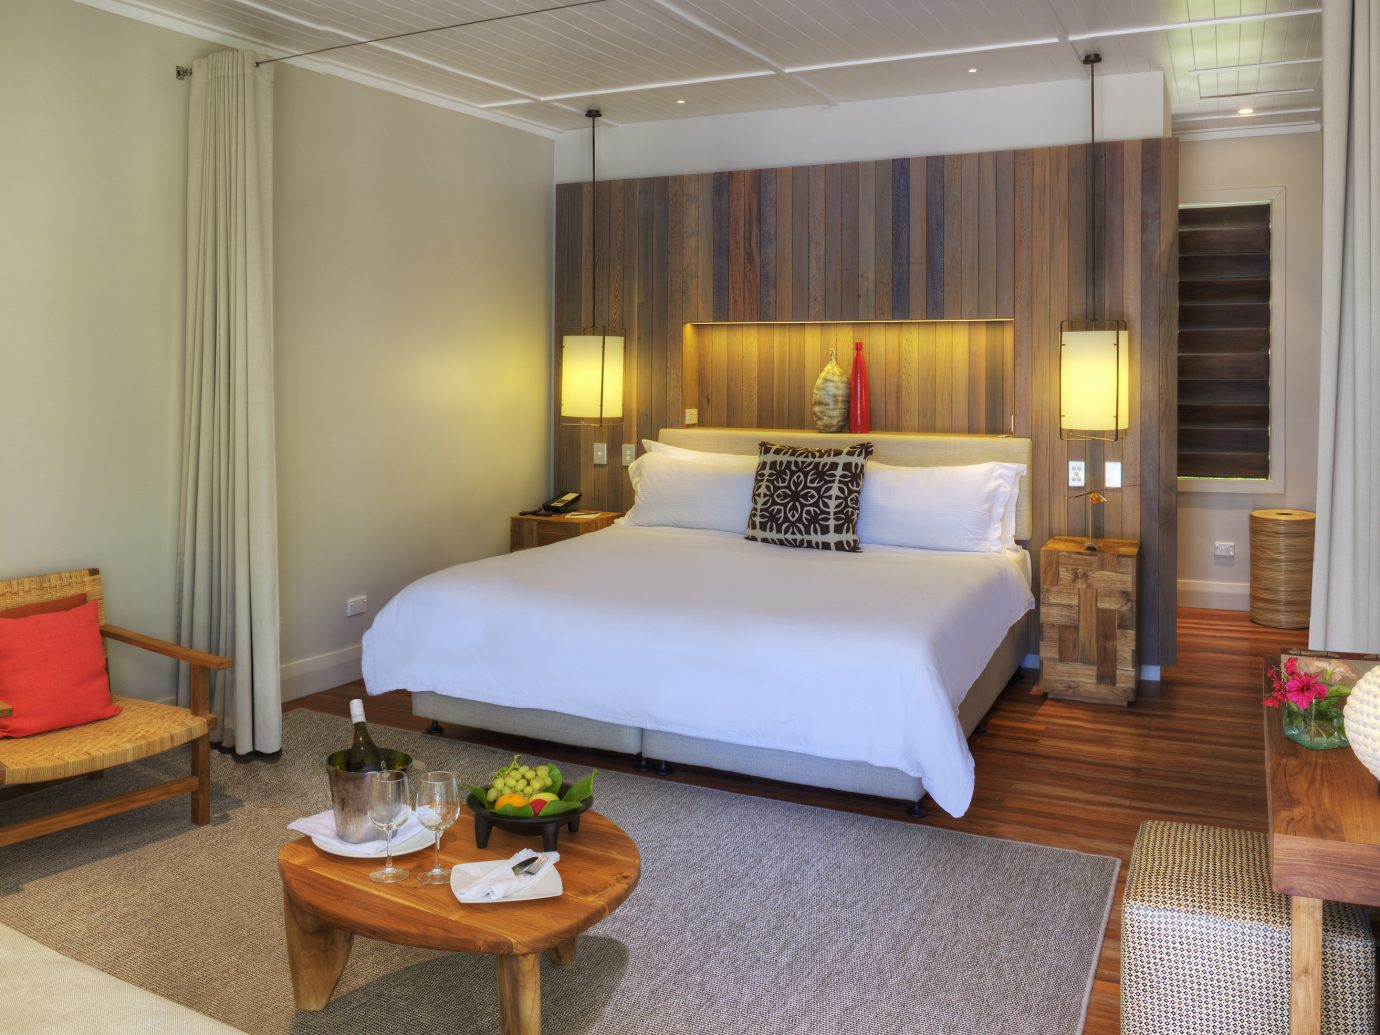 All-Inclusive Resorts Hotels Luxury Travel floor indoor wall Living room Suite interior design ceiling Bedroom real estate furniture hotel area